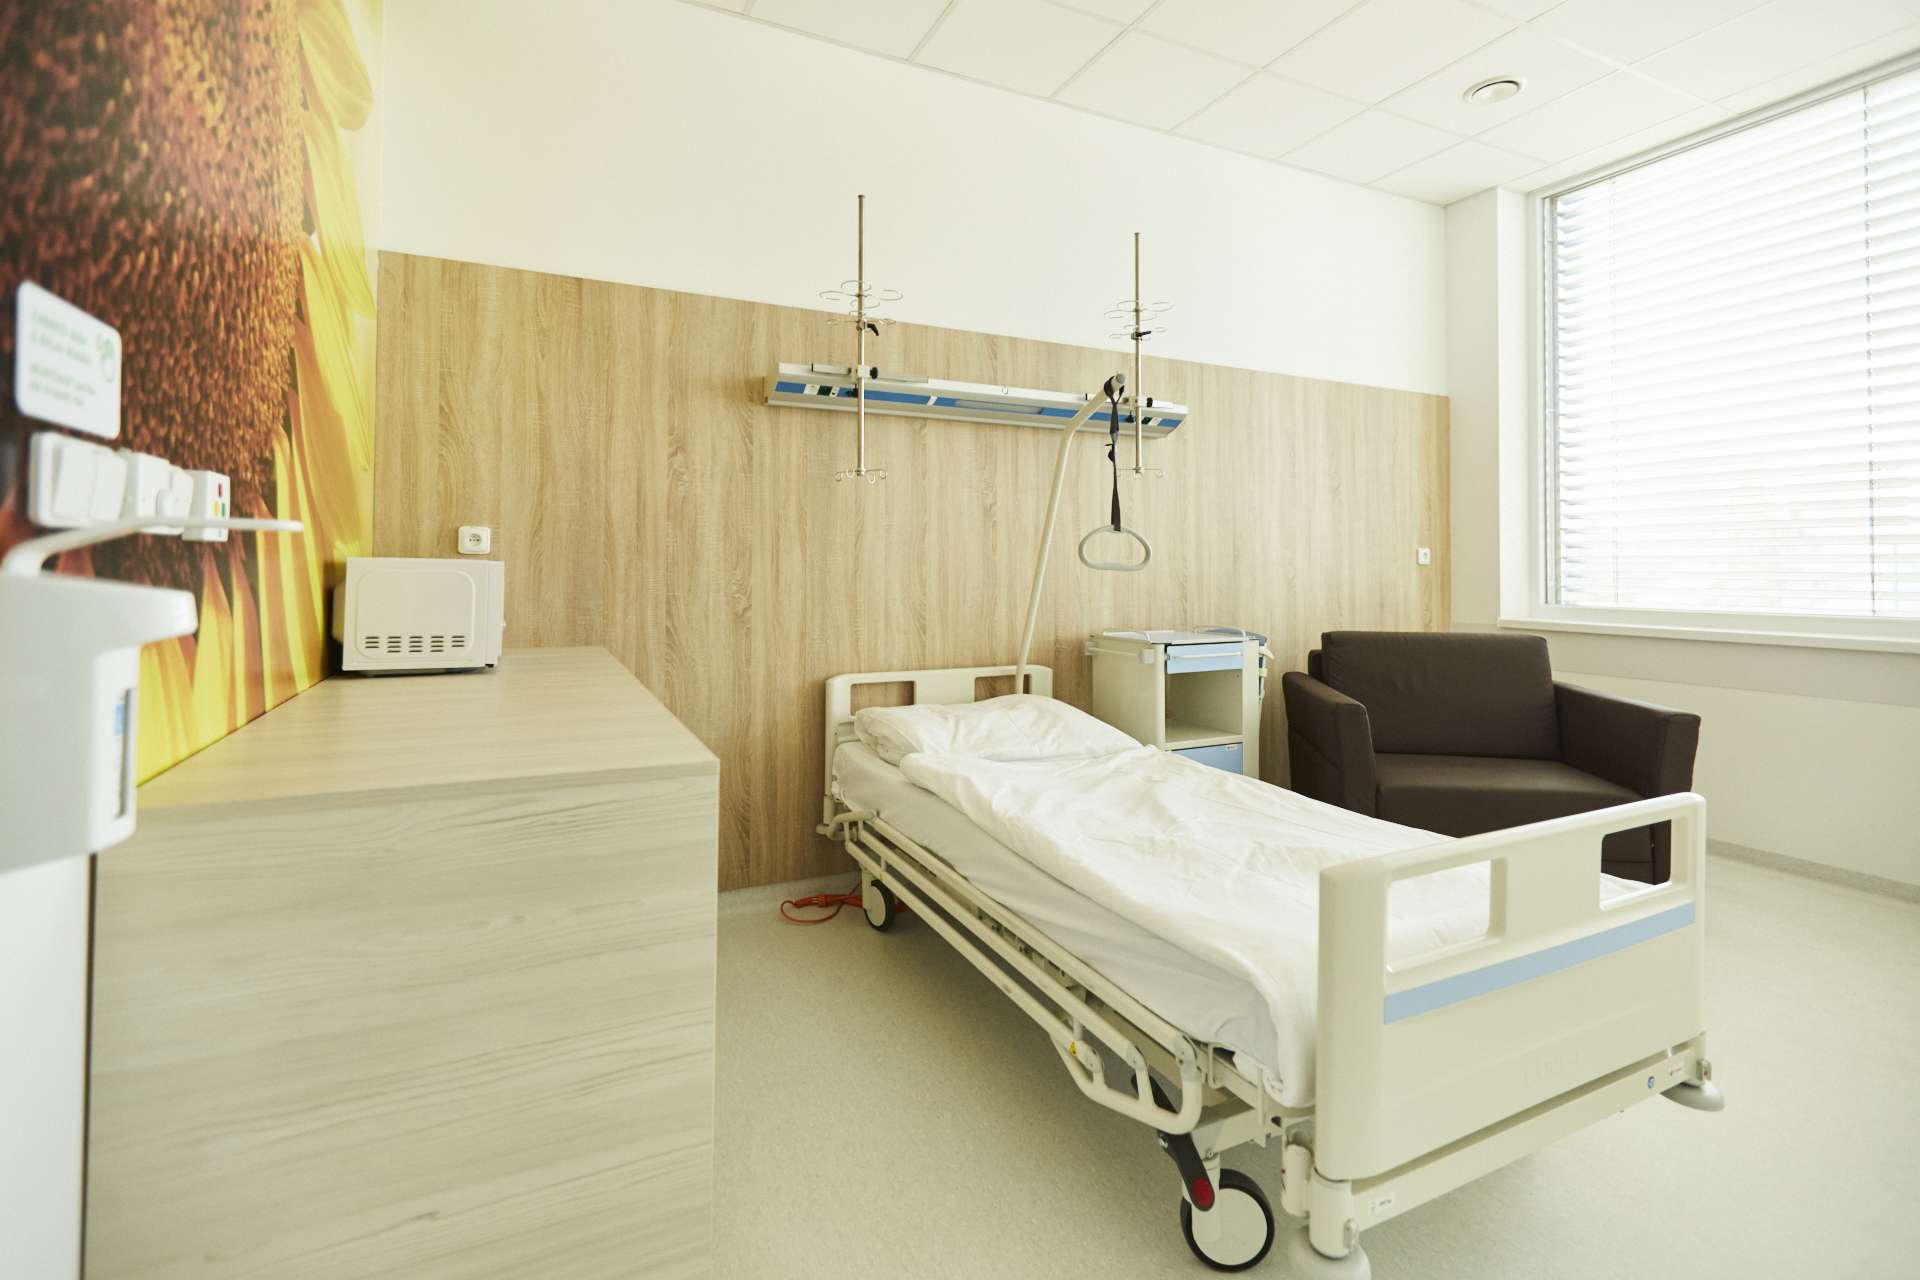 709b6dbcd mammarne-centrum-nemocnica-svet-zdravia-michalovce (28) - ProCare